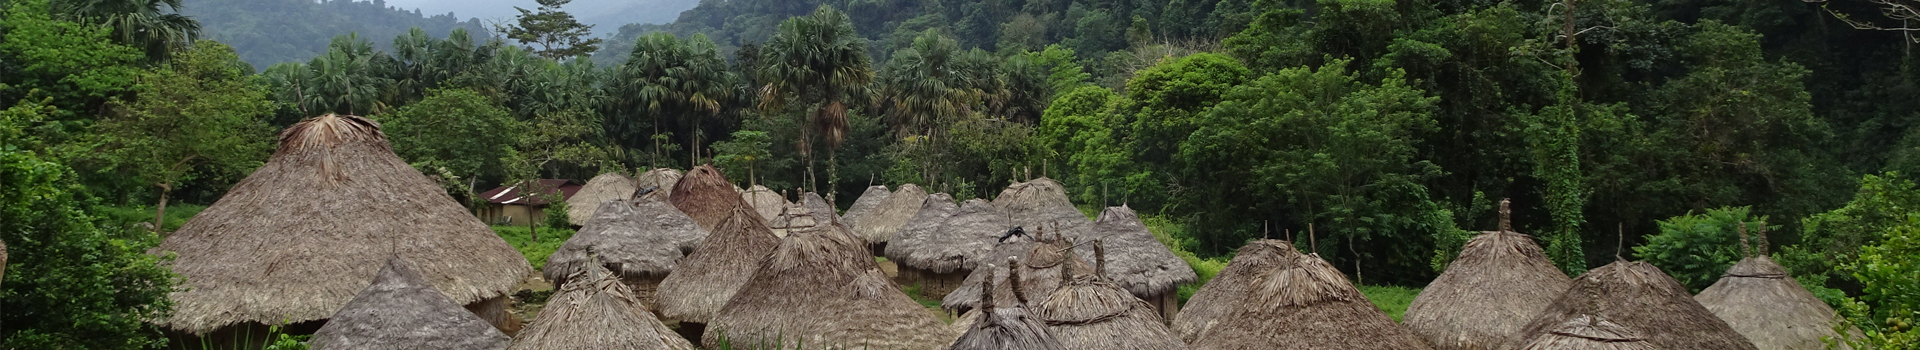 Schlagwort: Laos